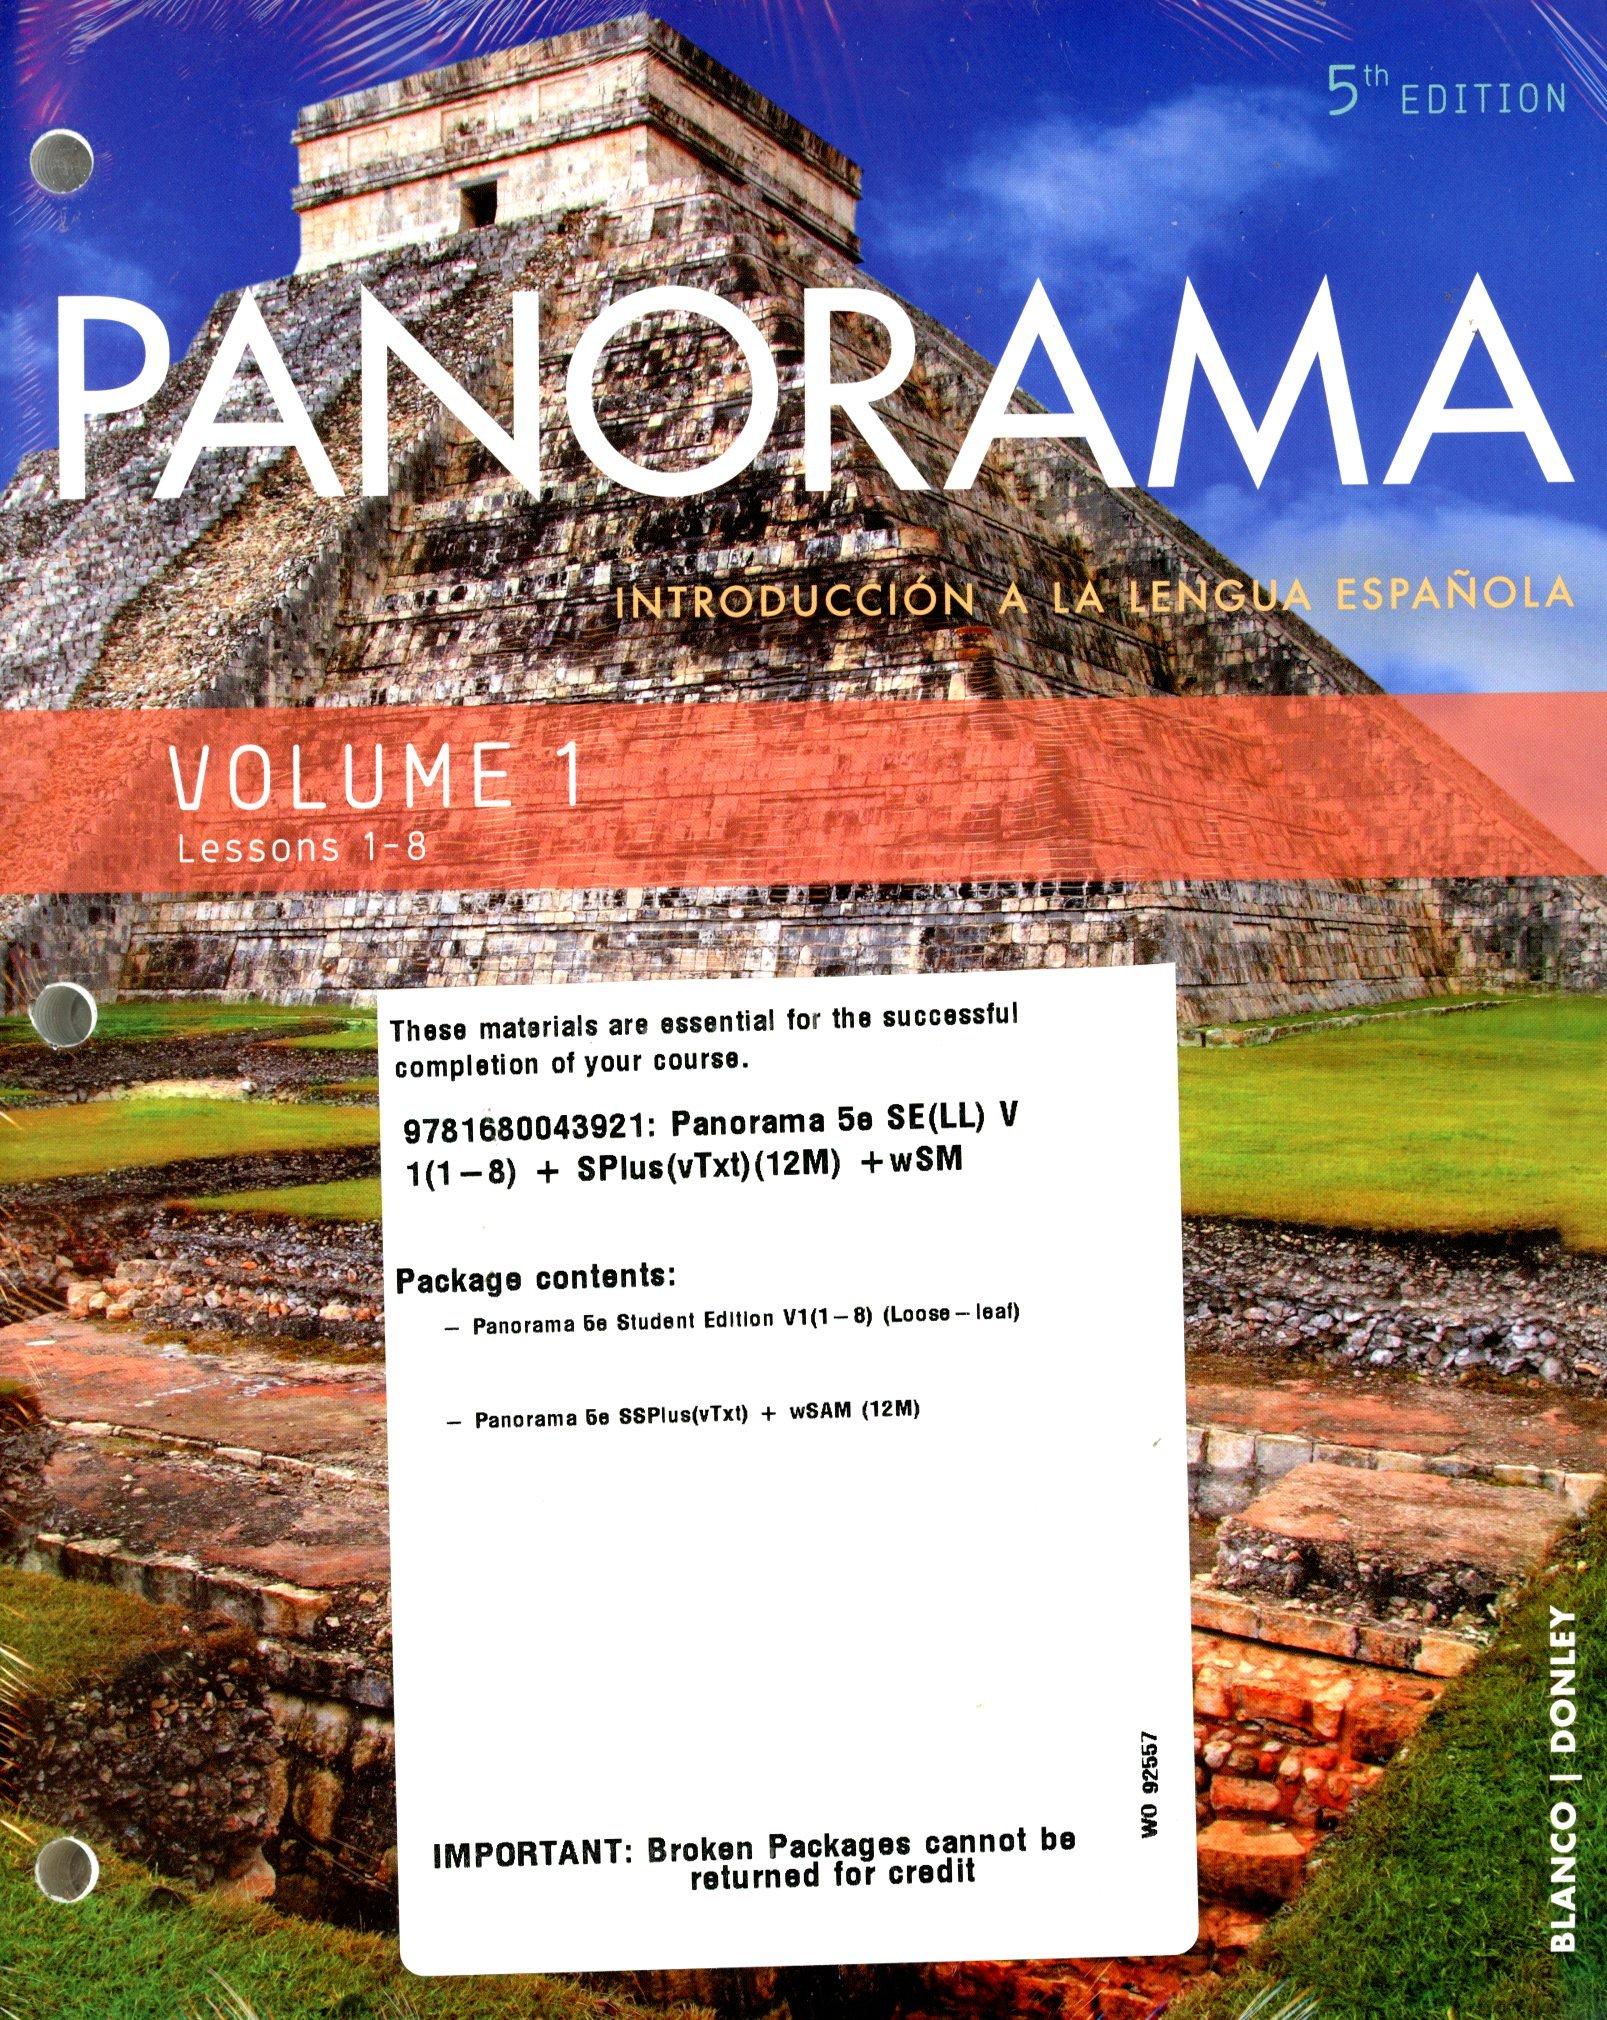 Panorama 5th Ed Looseleaf Vol 1 (Chp 1-8) w/ Supersite Plus (vTxt)(12mos) and WebSAM pdf